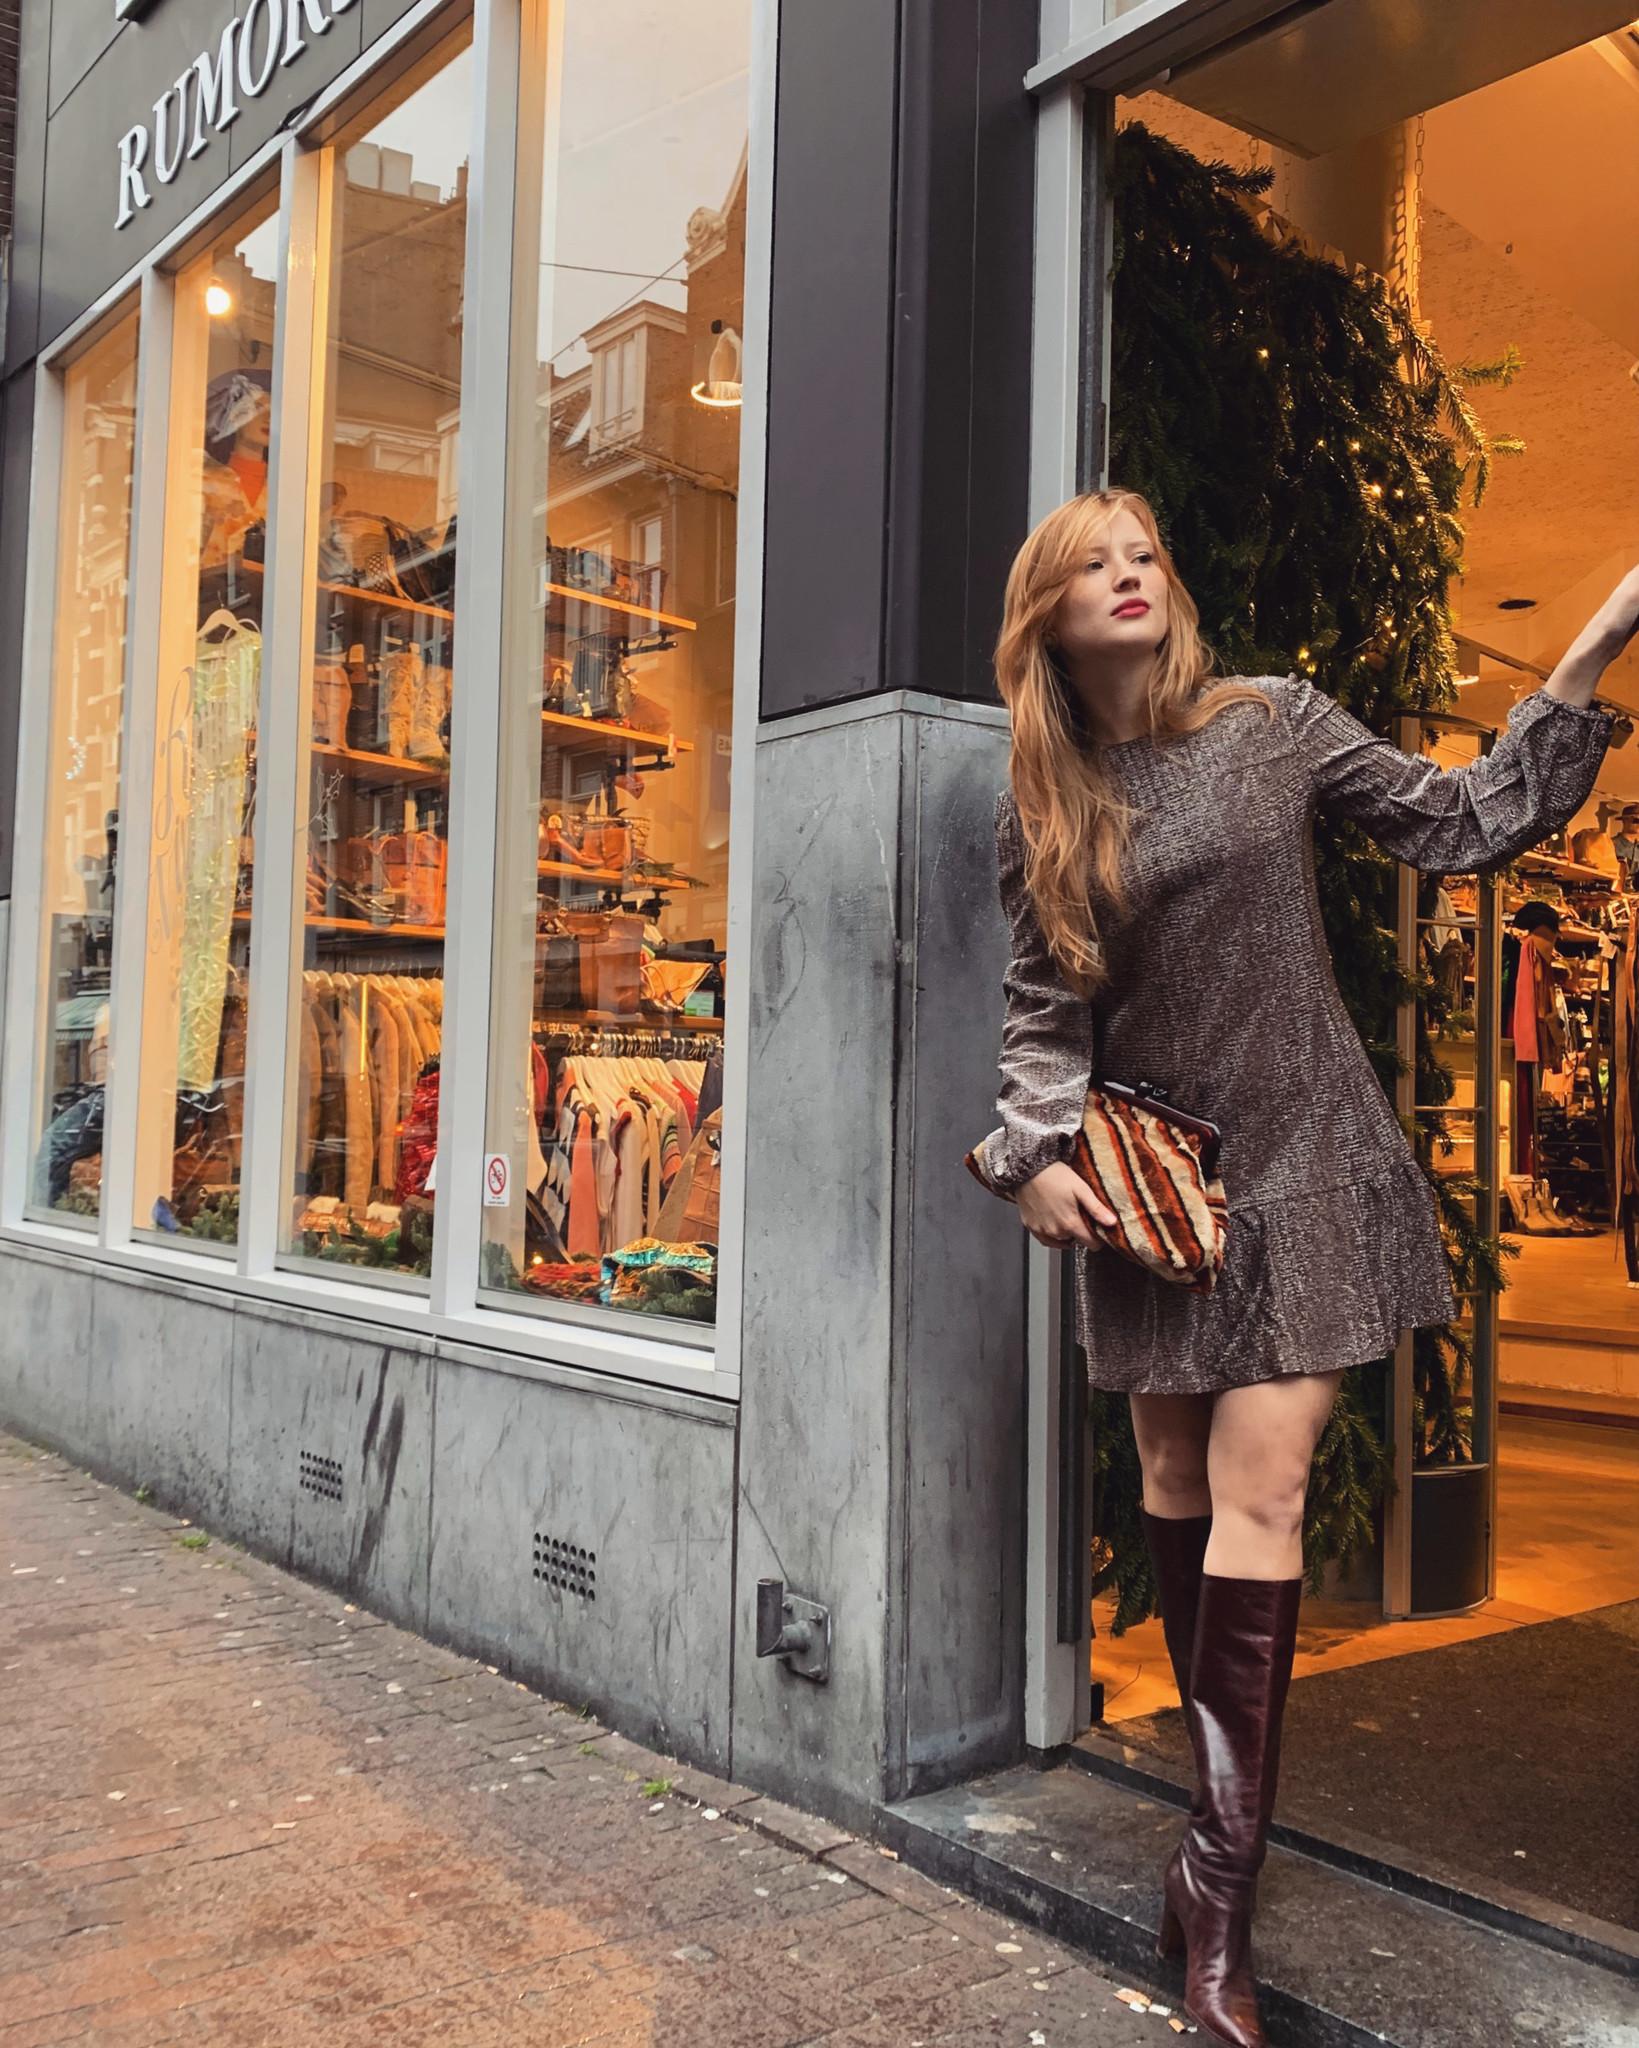 Rumors Vintage & Design Vintage Clothing Store Amsterdam